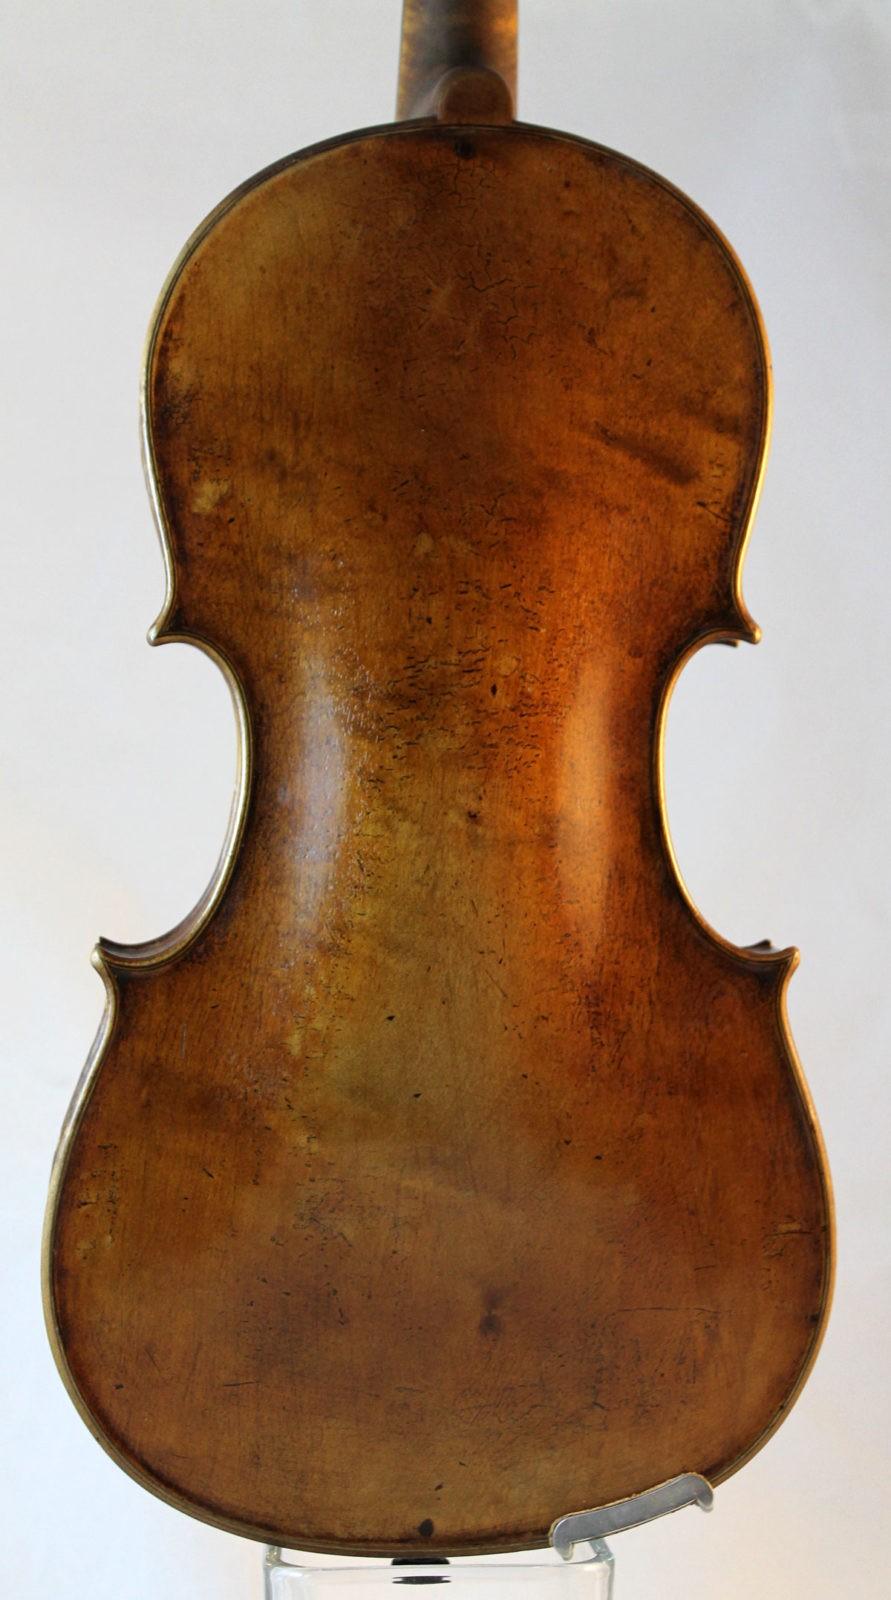 Amati violin for sale - back